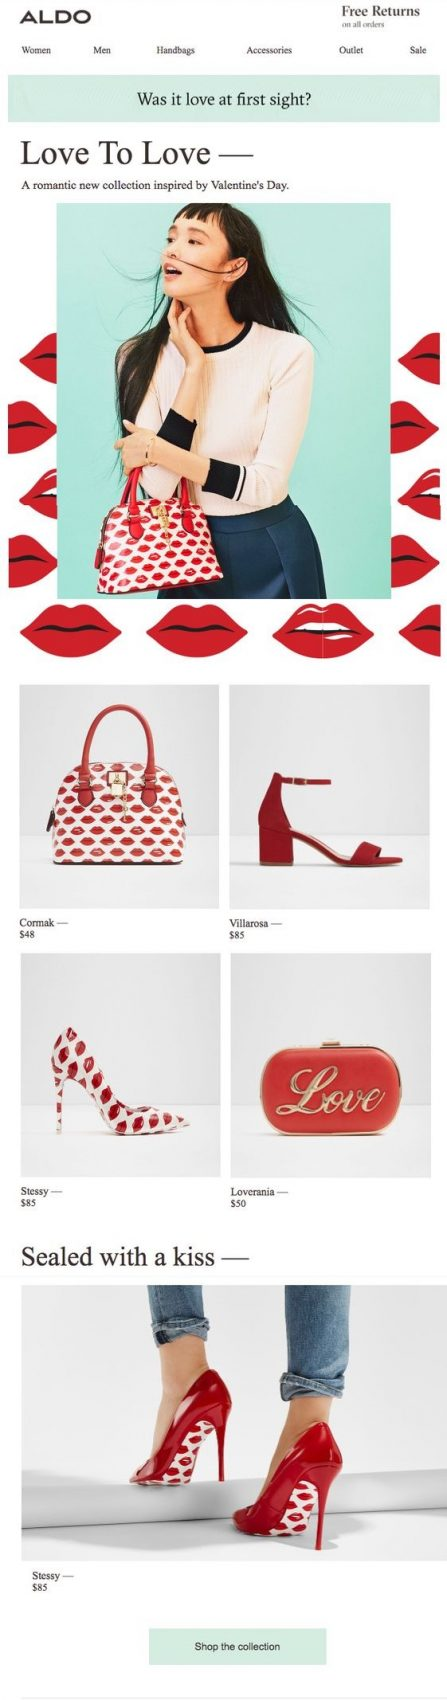 aldo valentines email example